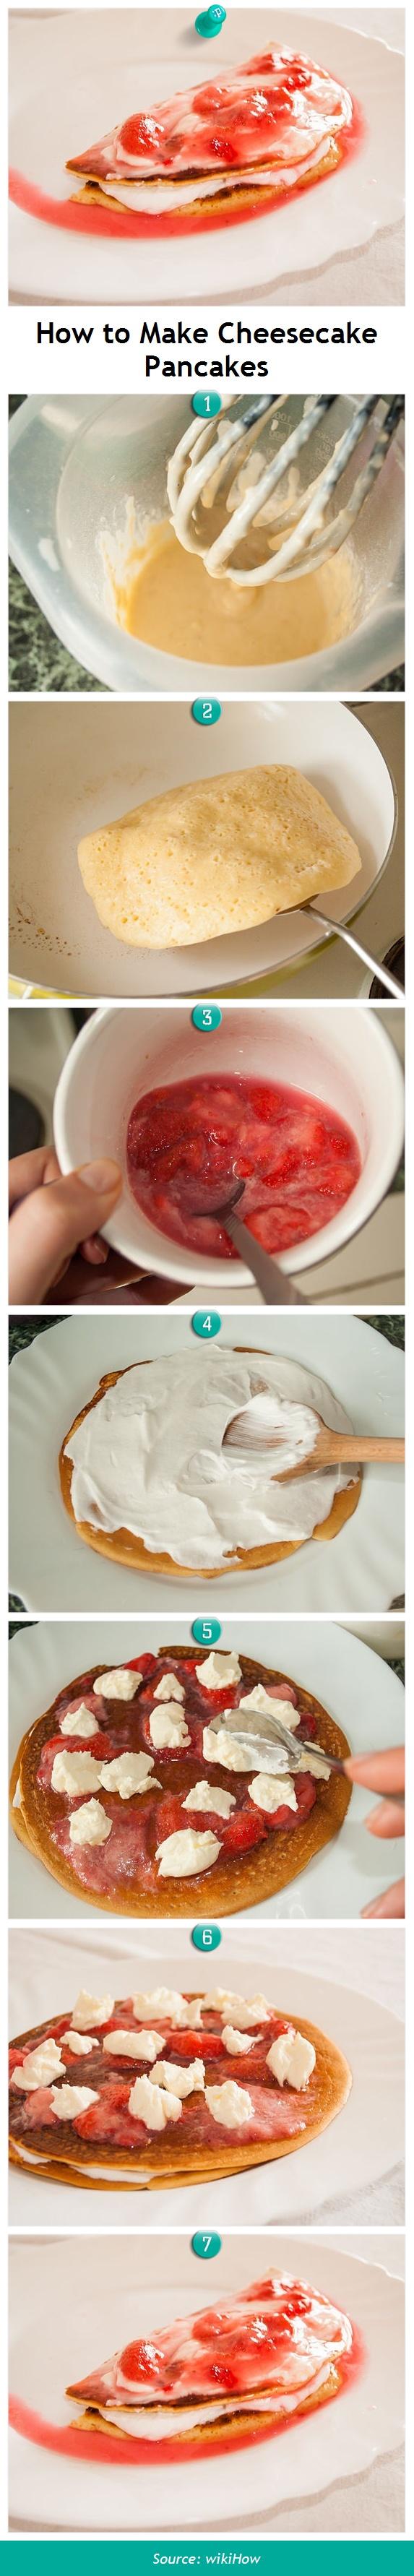 Make cheesecake pancakes cheesecake pancakes pancakes and cheesecakes pancakes easy ccuart Gallery